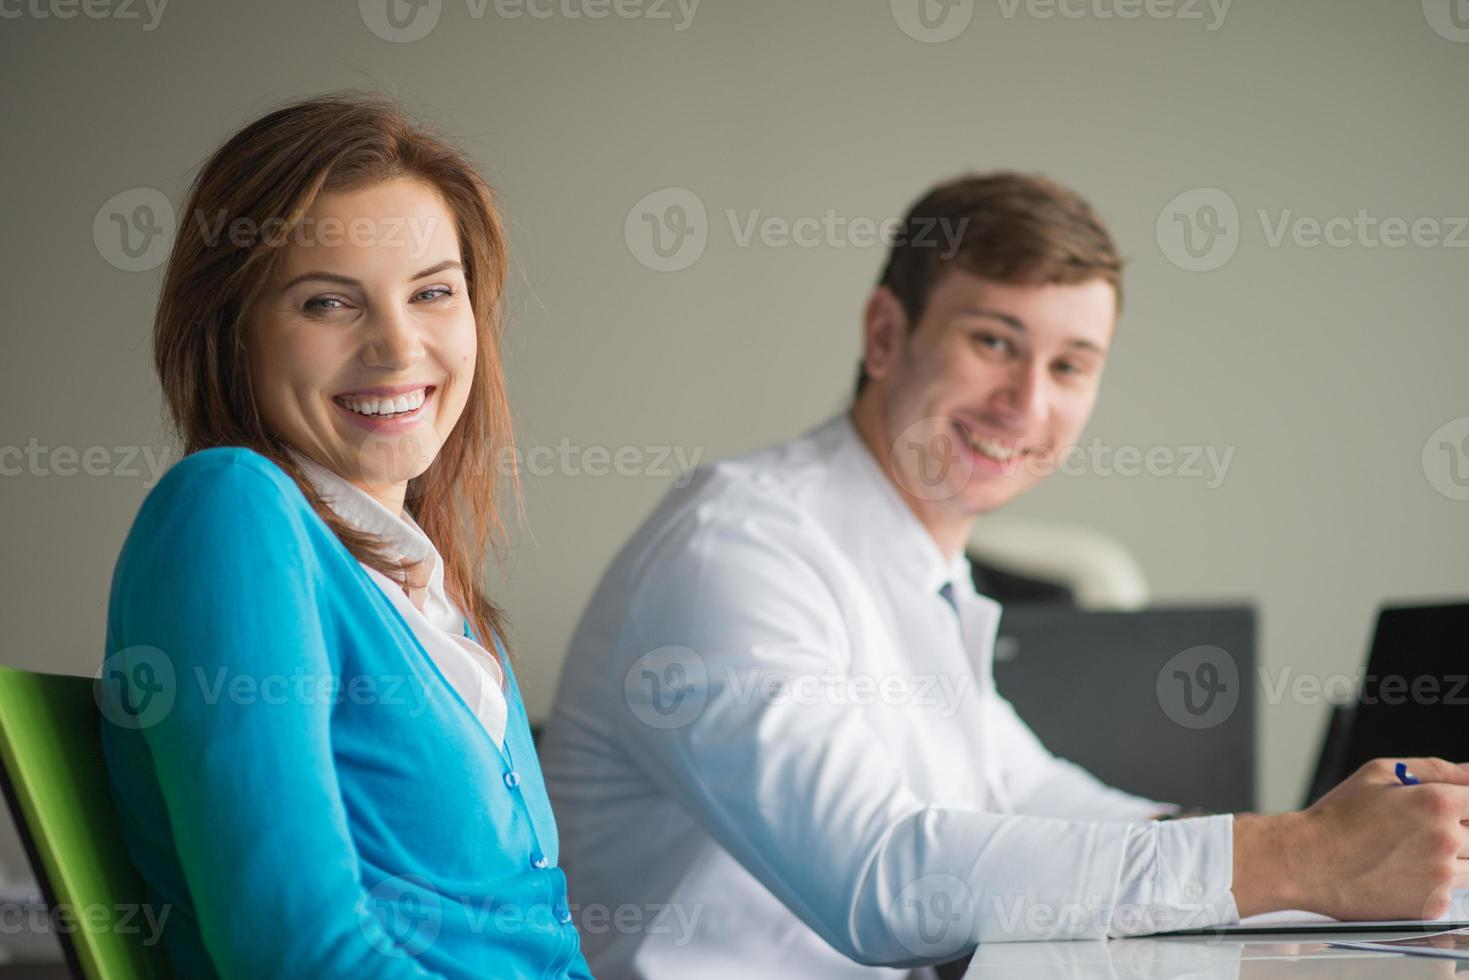 patiënt en arts foto